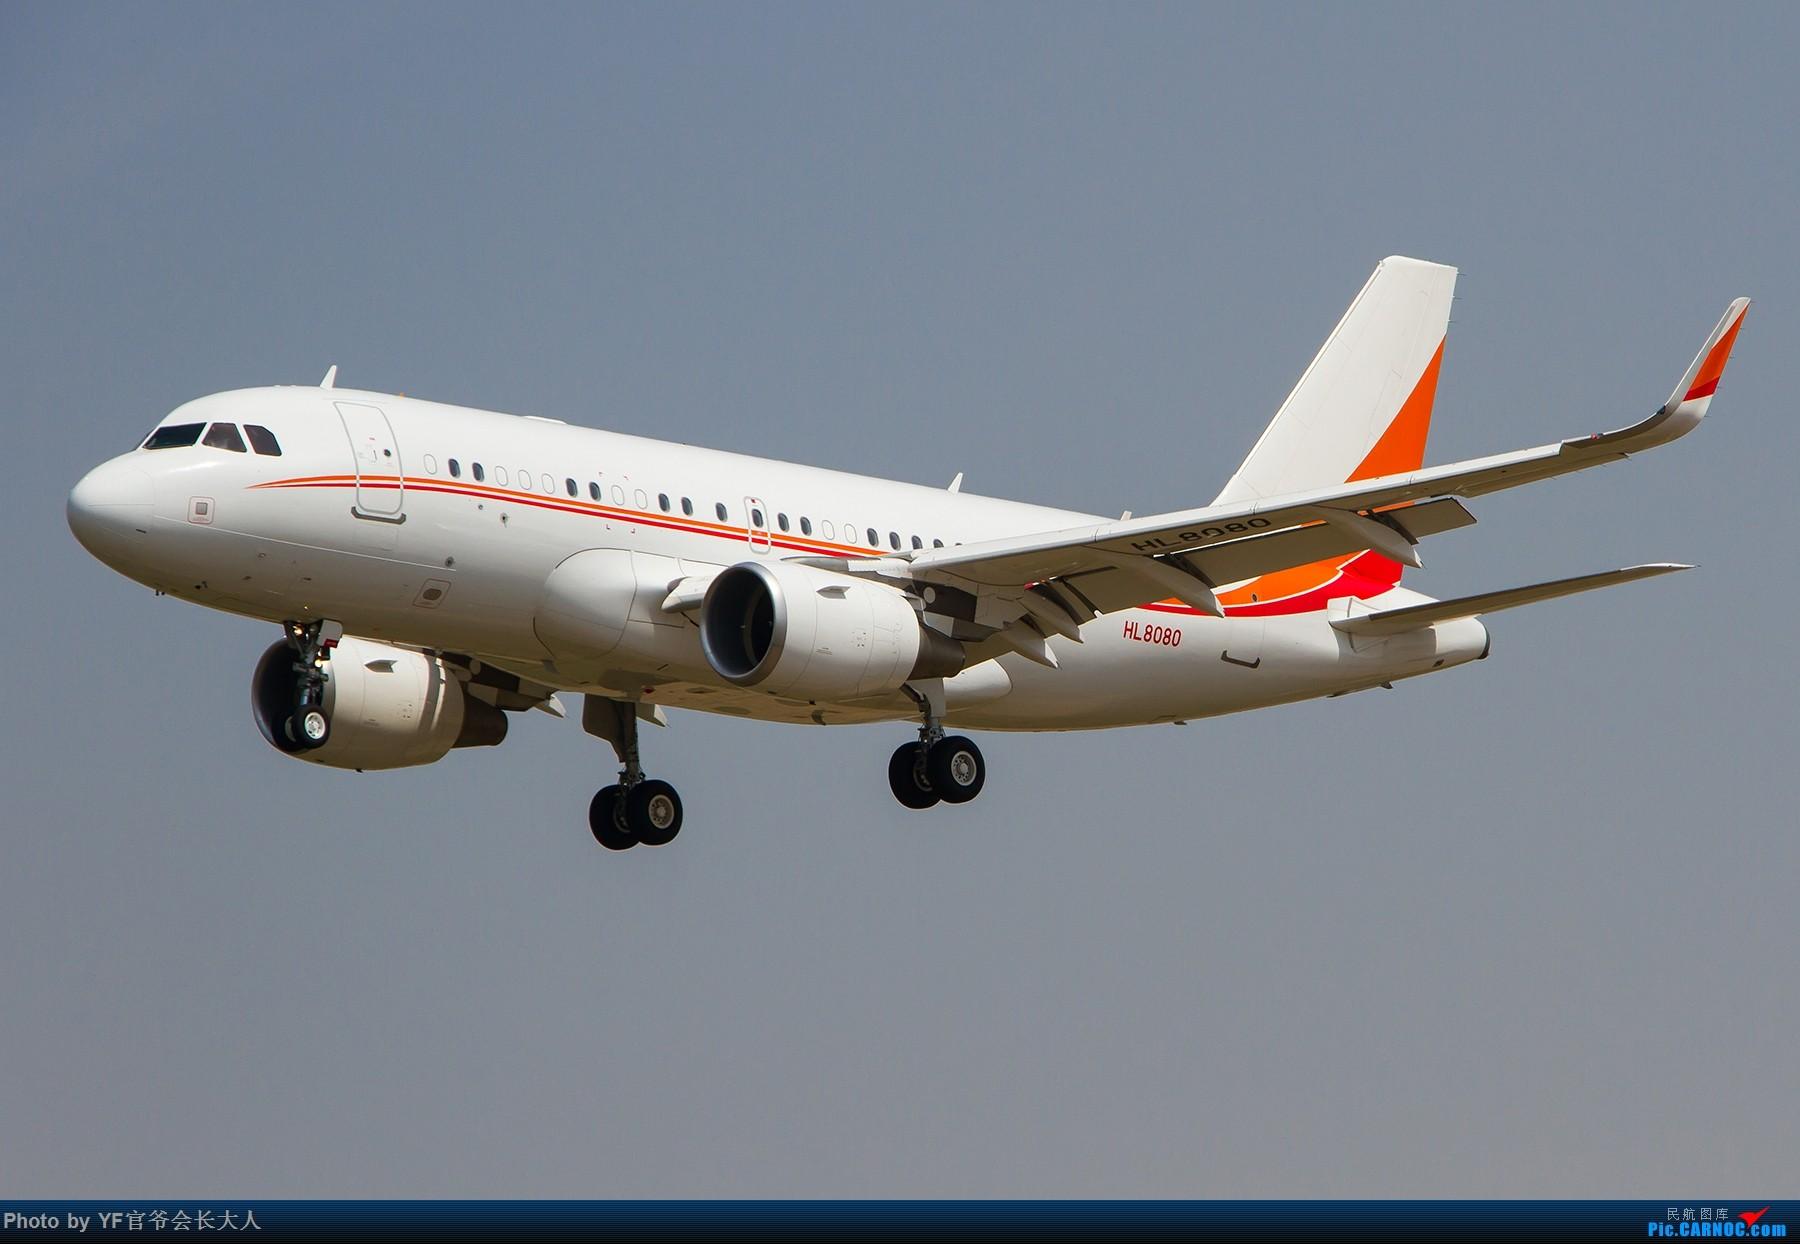 Re:[原创]【ZYTX】轻易不拍机,拍就要拍个过瘾!(新开的酷鸟,亚洲大西洋,顺带碰上朝韩两国的好货) AIRBUS A319-115(CJ)(WL) HL8080 中国沈阳桃仙国际机场